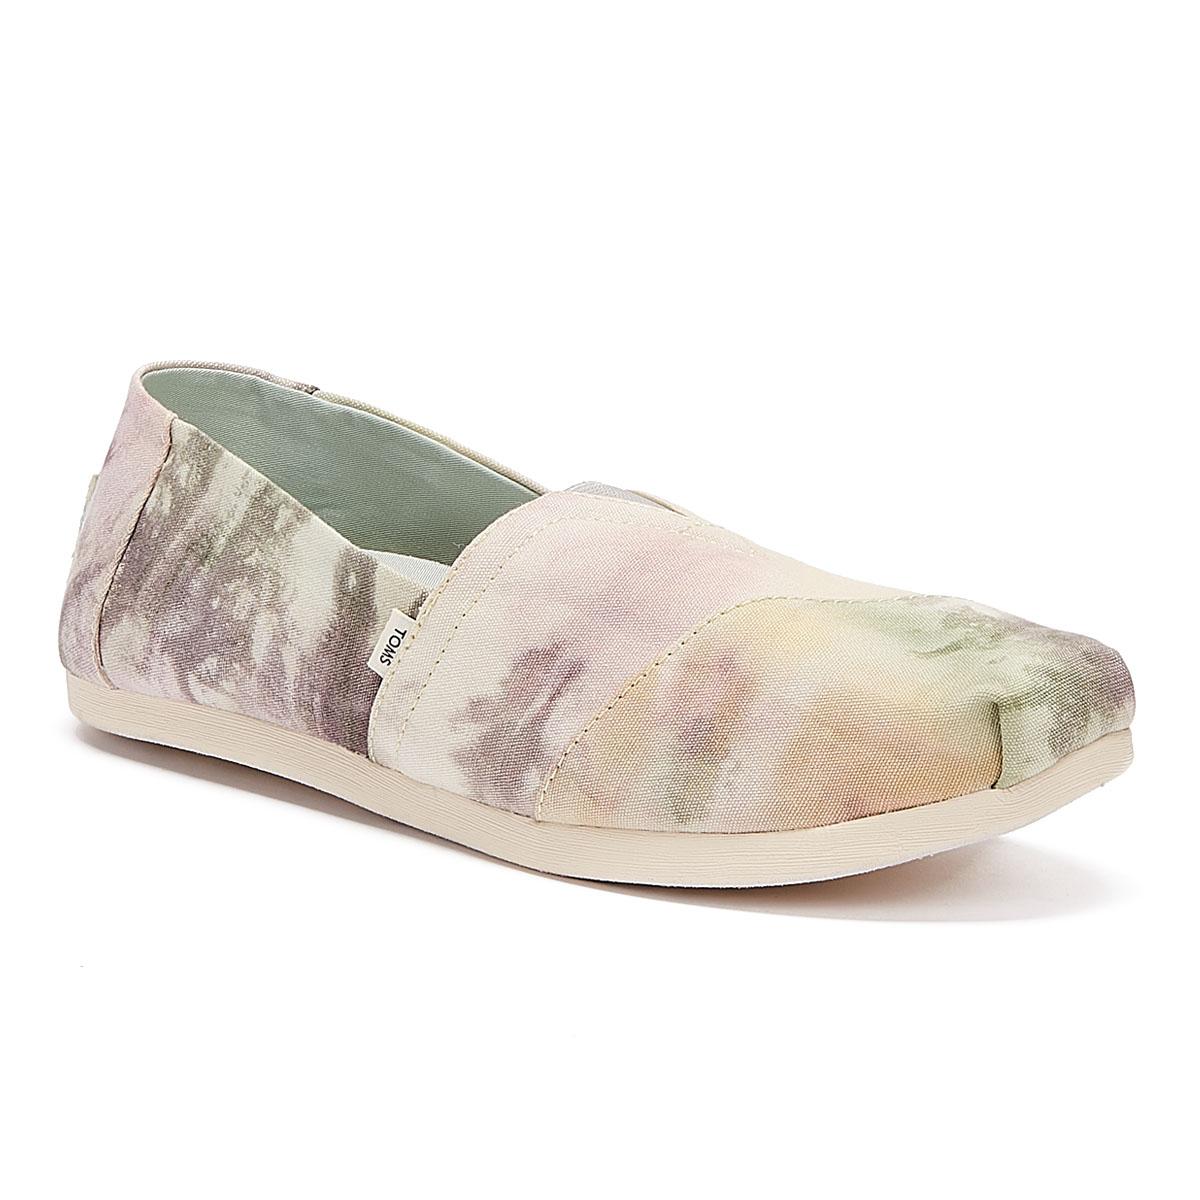 TOMS Alpargata Tie Dye Womens Pink Espadrilles Casual Summer Shoes Flatform